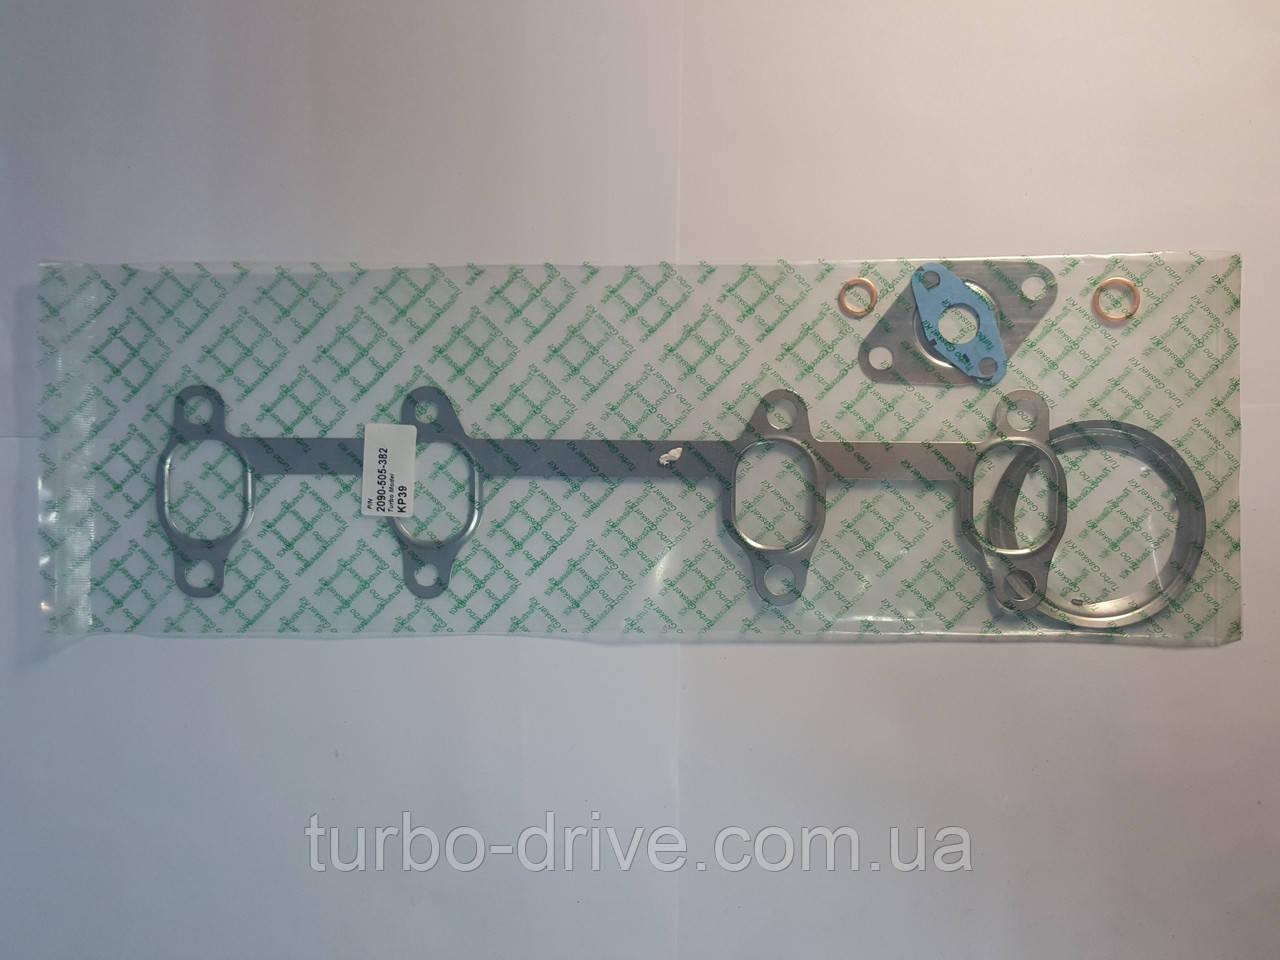 Комплект прокладок турбины Scoda Octavia \ Fabia 1.9 TDi